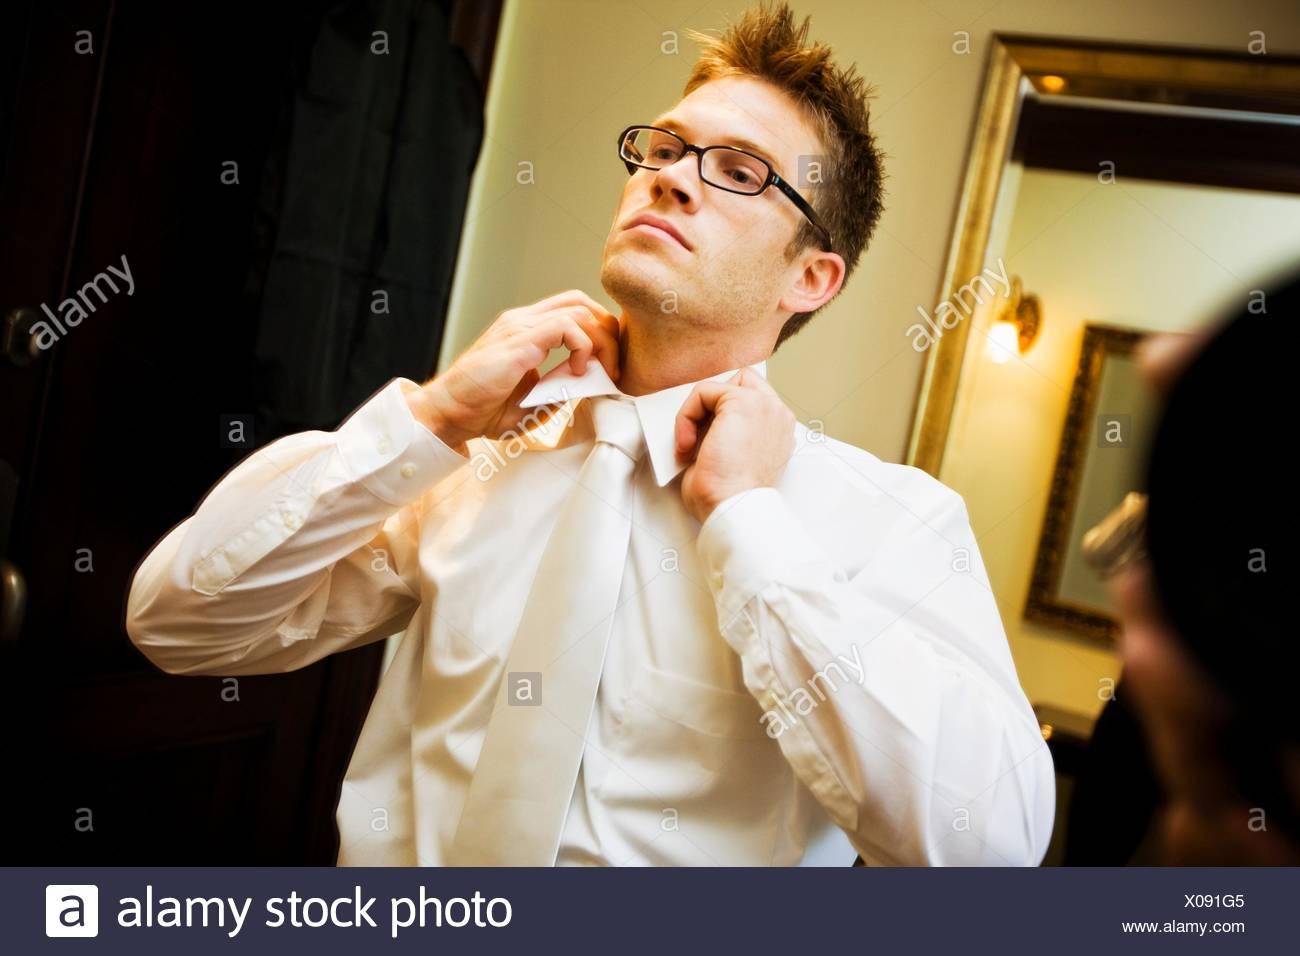 Groom, man putting on tie - Stock Image